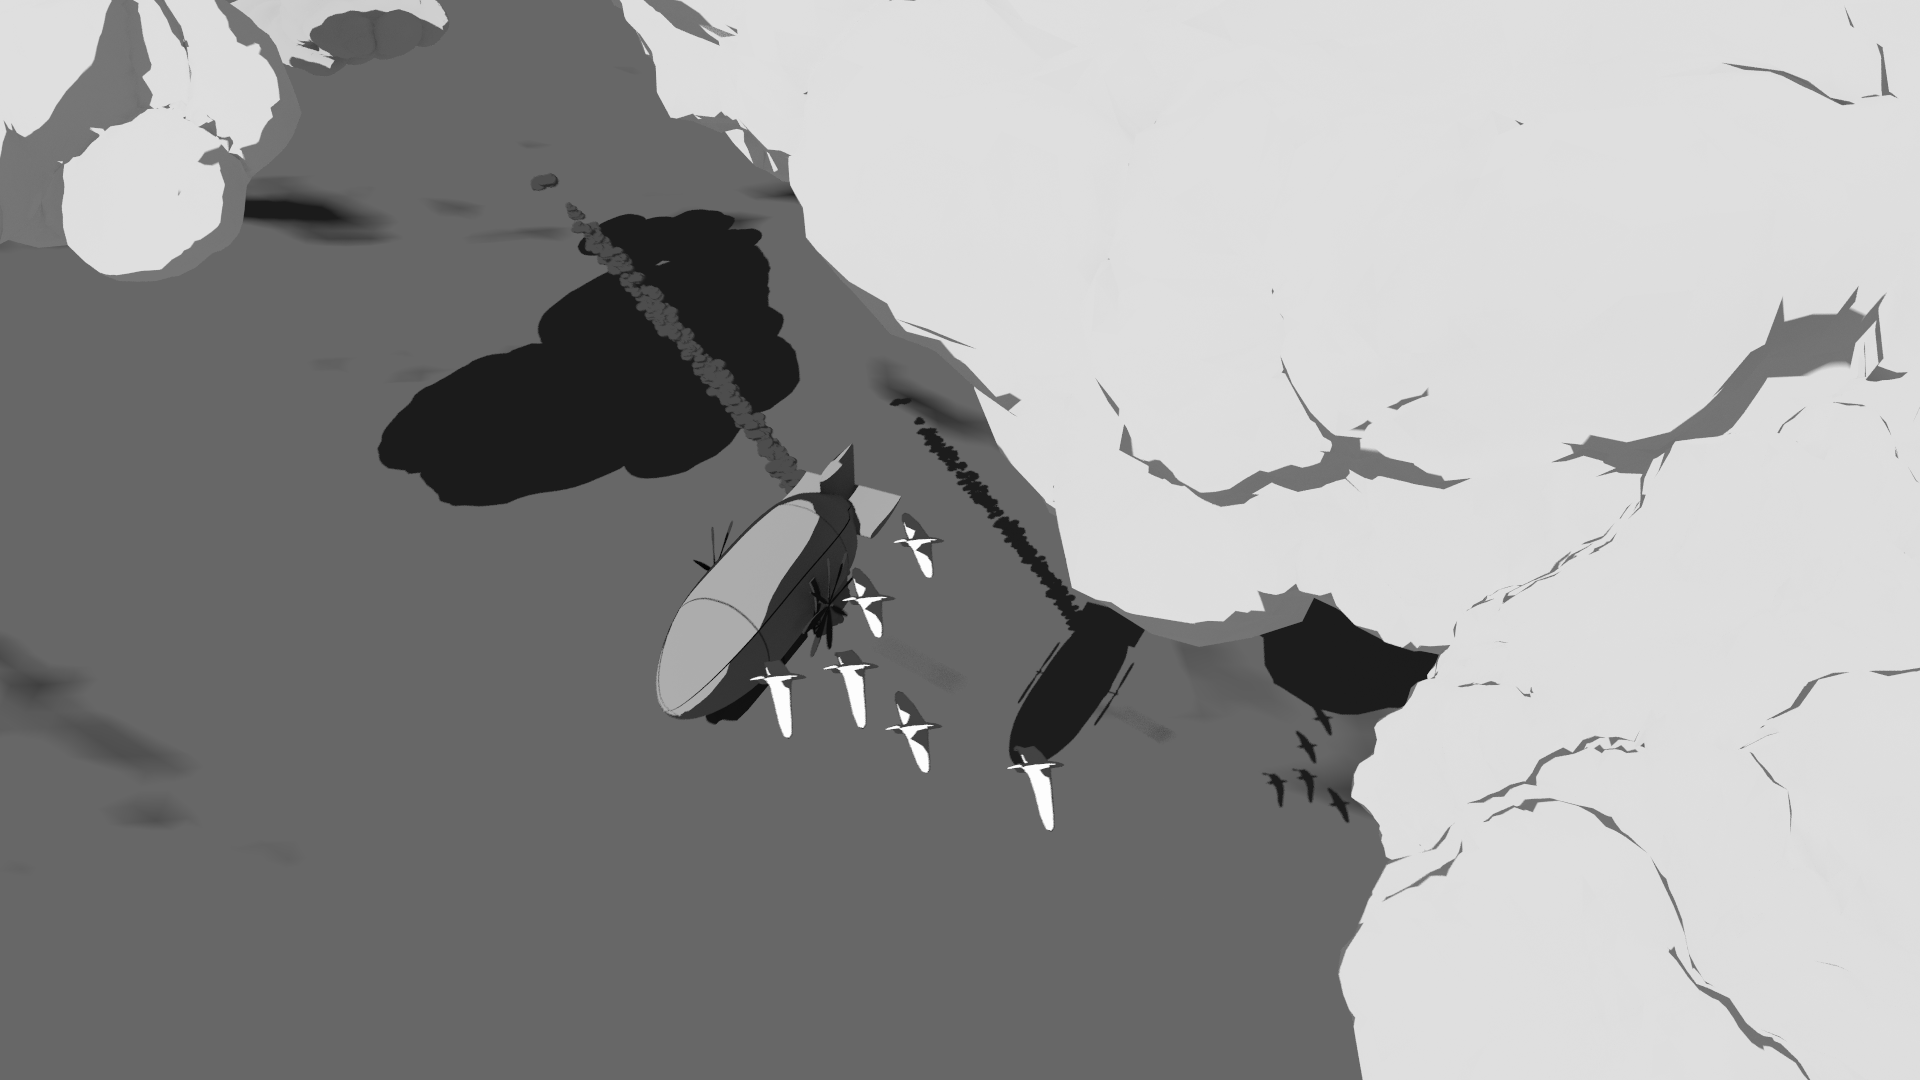 animation, shading & light (coming soon)